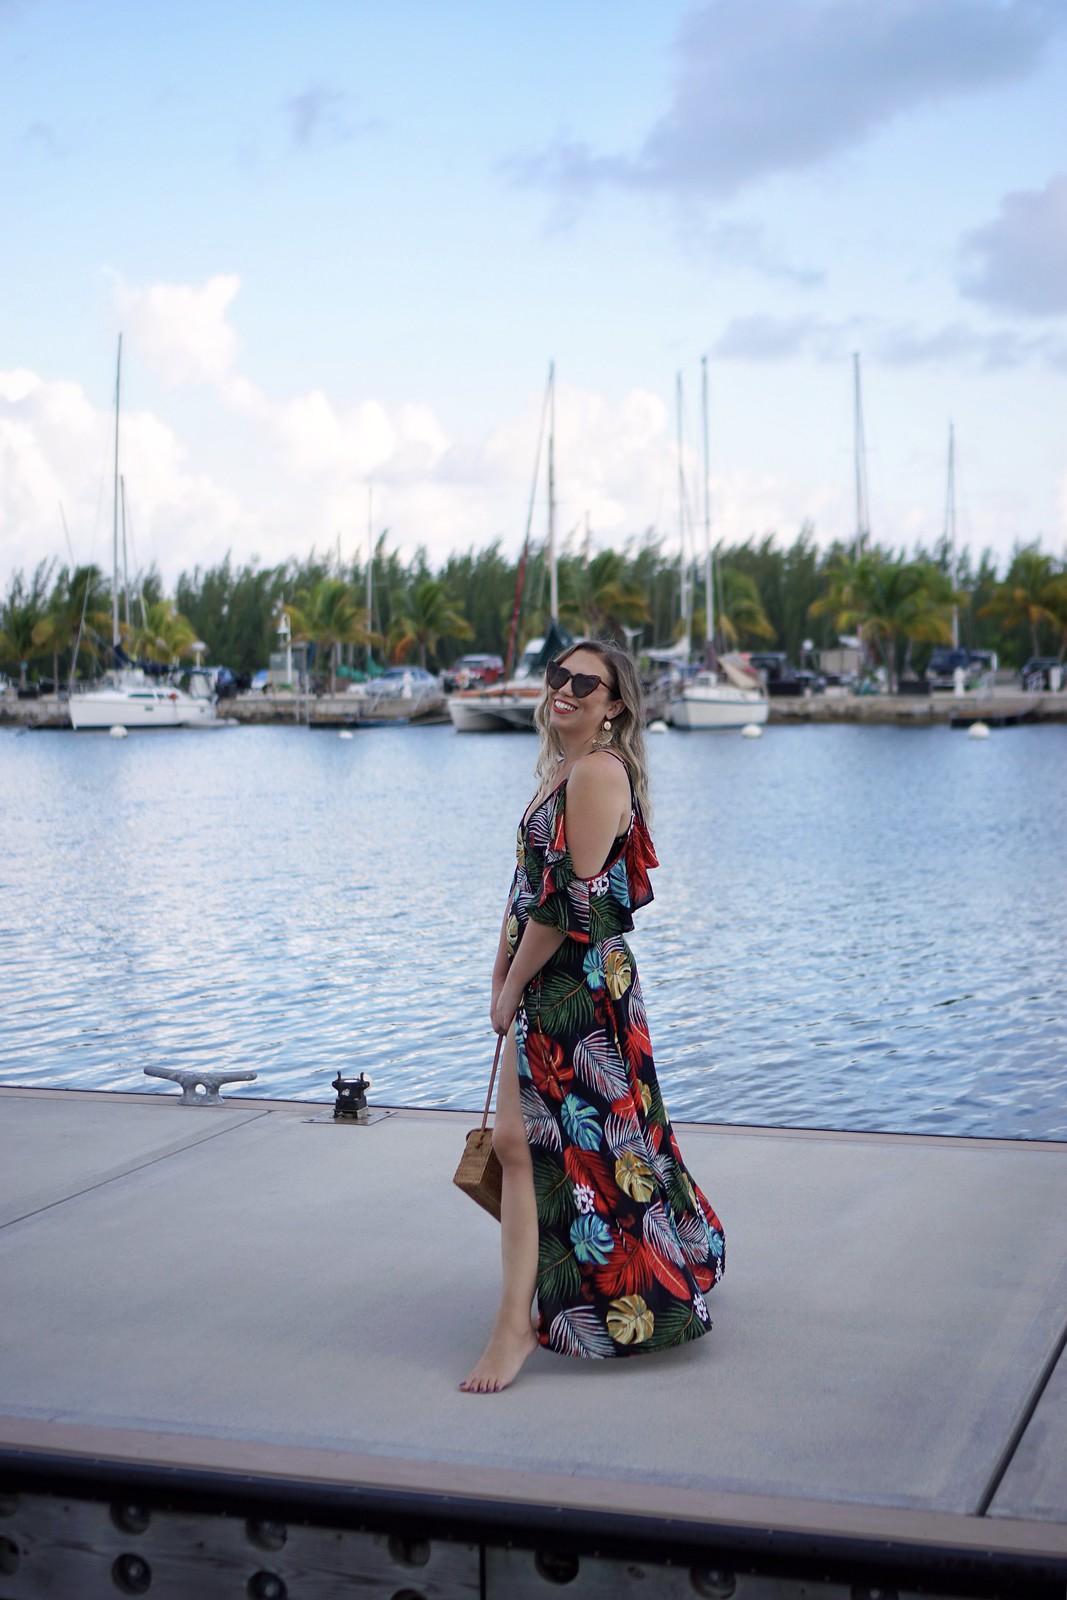 tropical-dress-stock-island-marina-ultimate-road-trip-5-days-florida-keys-itinerary-what-to-do-key-west-key-largo-islamorada-marathon-miami-vacation-guide